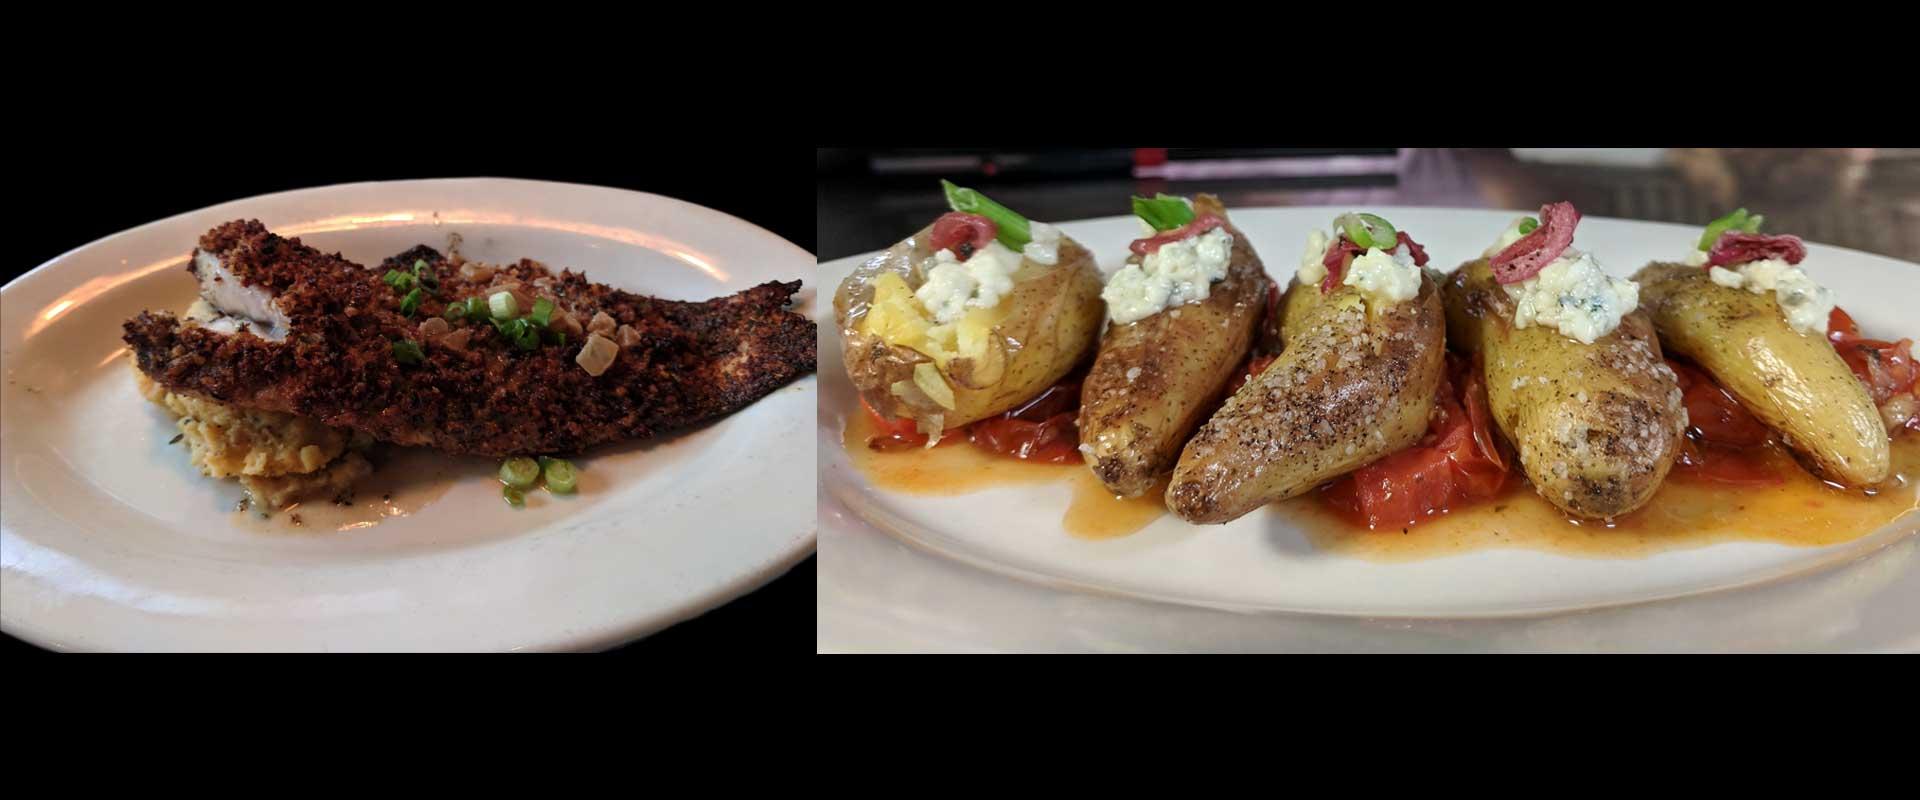 Cajun Creole Restaurant Bar Catering Bon Temps Grill